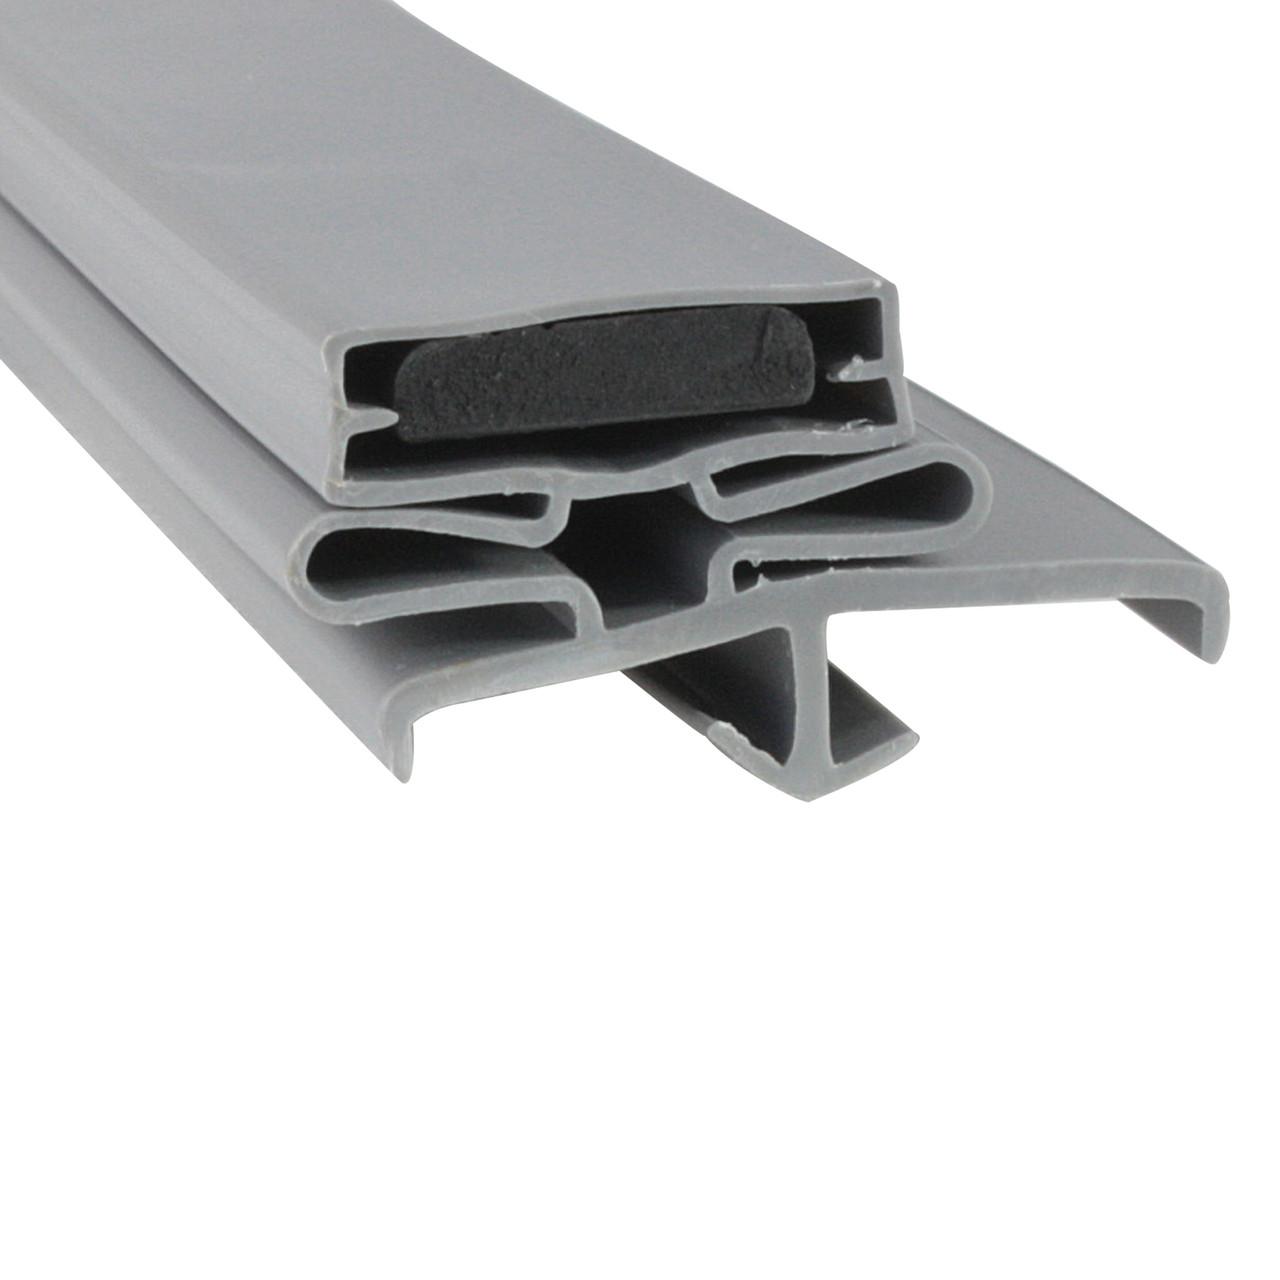 Delfield Door Gasket Profile 168 12 x 30 -A2.0833, 170-1125-C